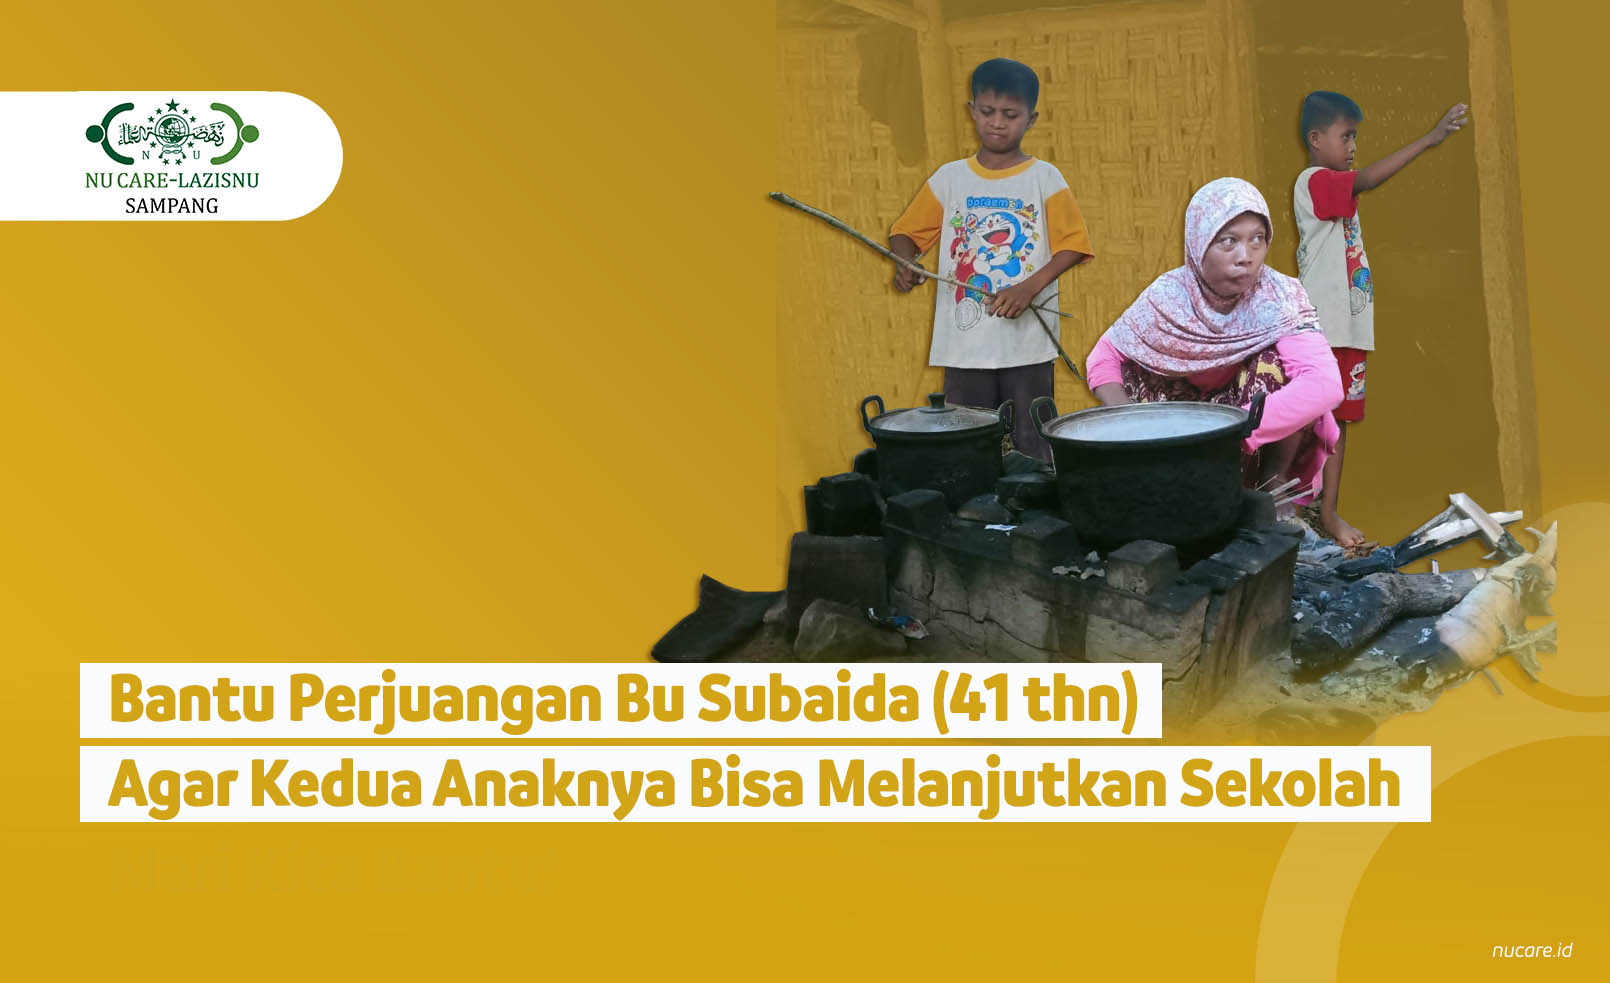 Ulurkan Tangan untuk Bantu Keluarga Bu Subaida!